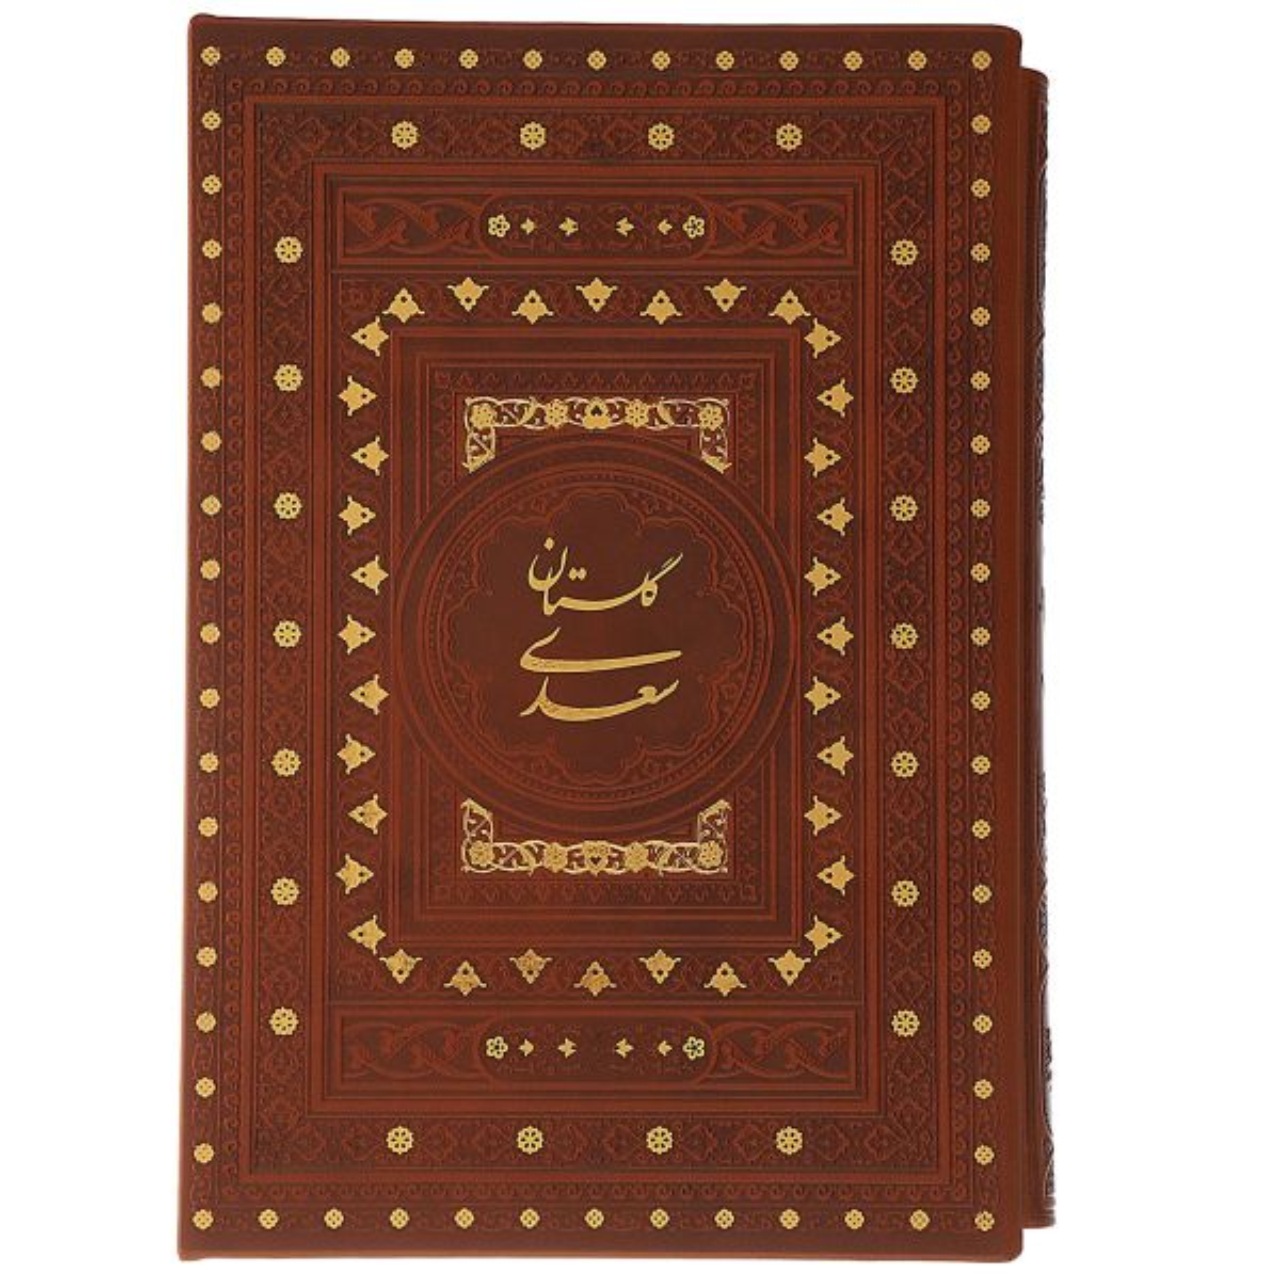 کتاب گلستان سعدی اثر مصلح بن عبدالله سعدی شیرازی